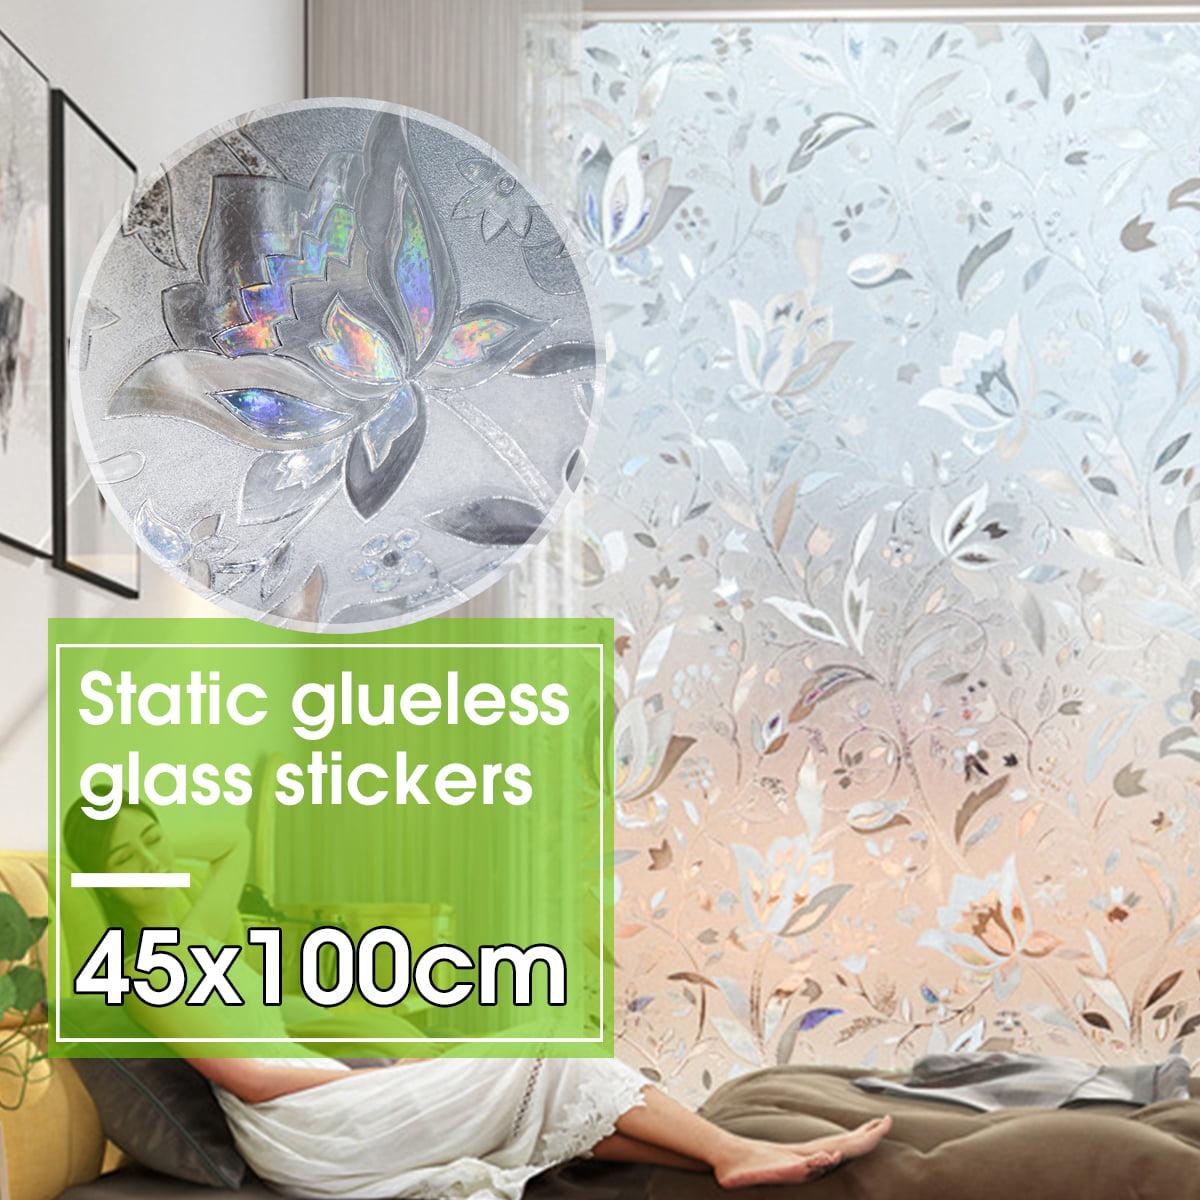 45x100cm Glueless Static Mosaic 3D Waterproof Glass Sticker Kitchen Home Decal